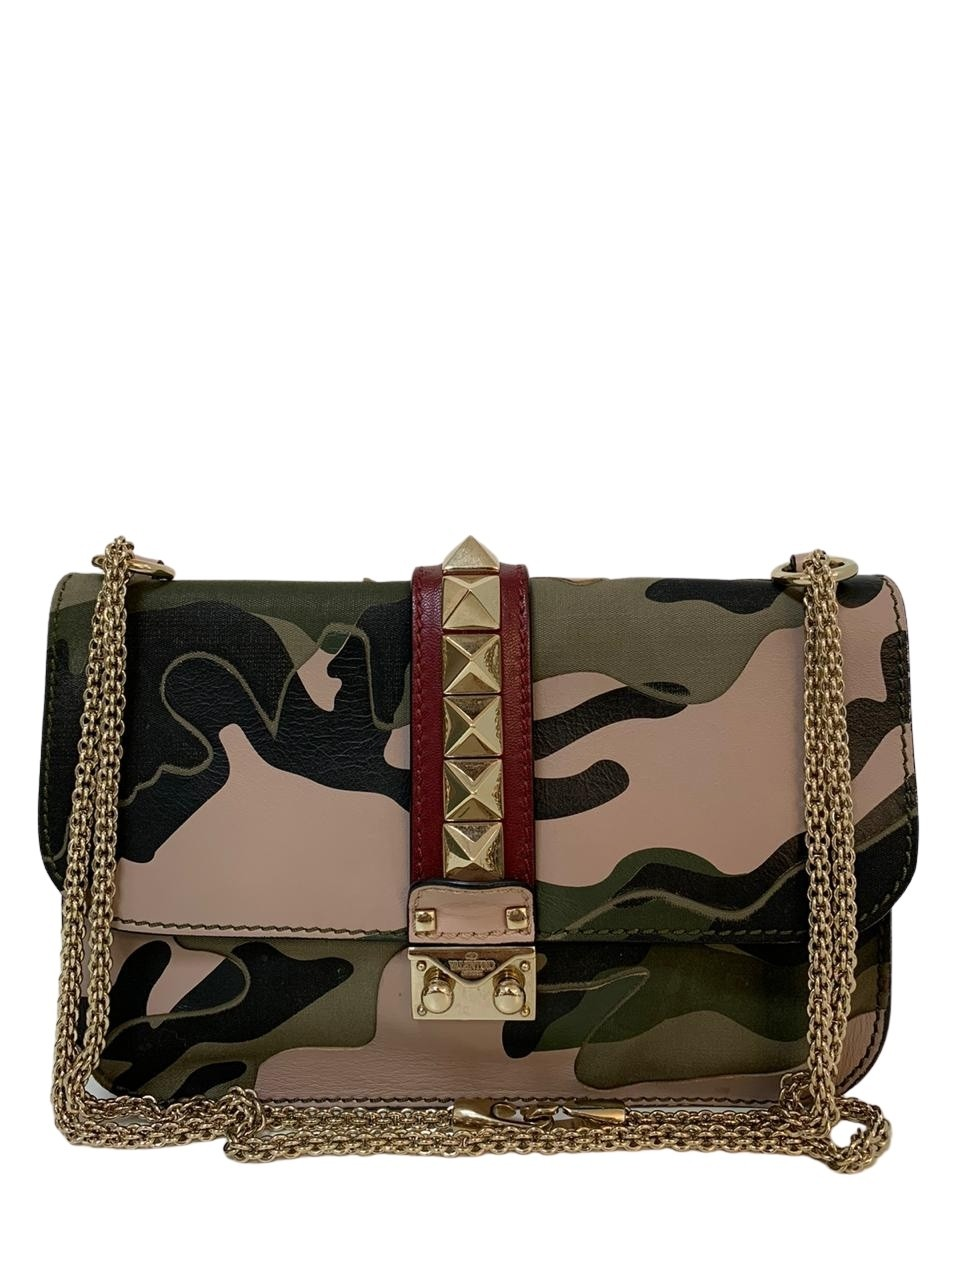 Bolsa Valentino Rockstud Camouflage